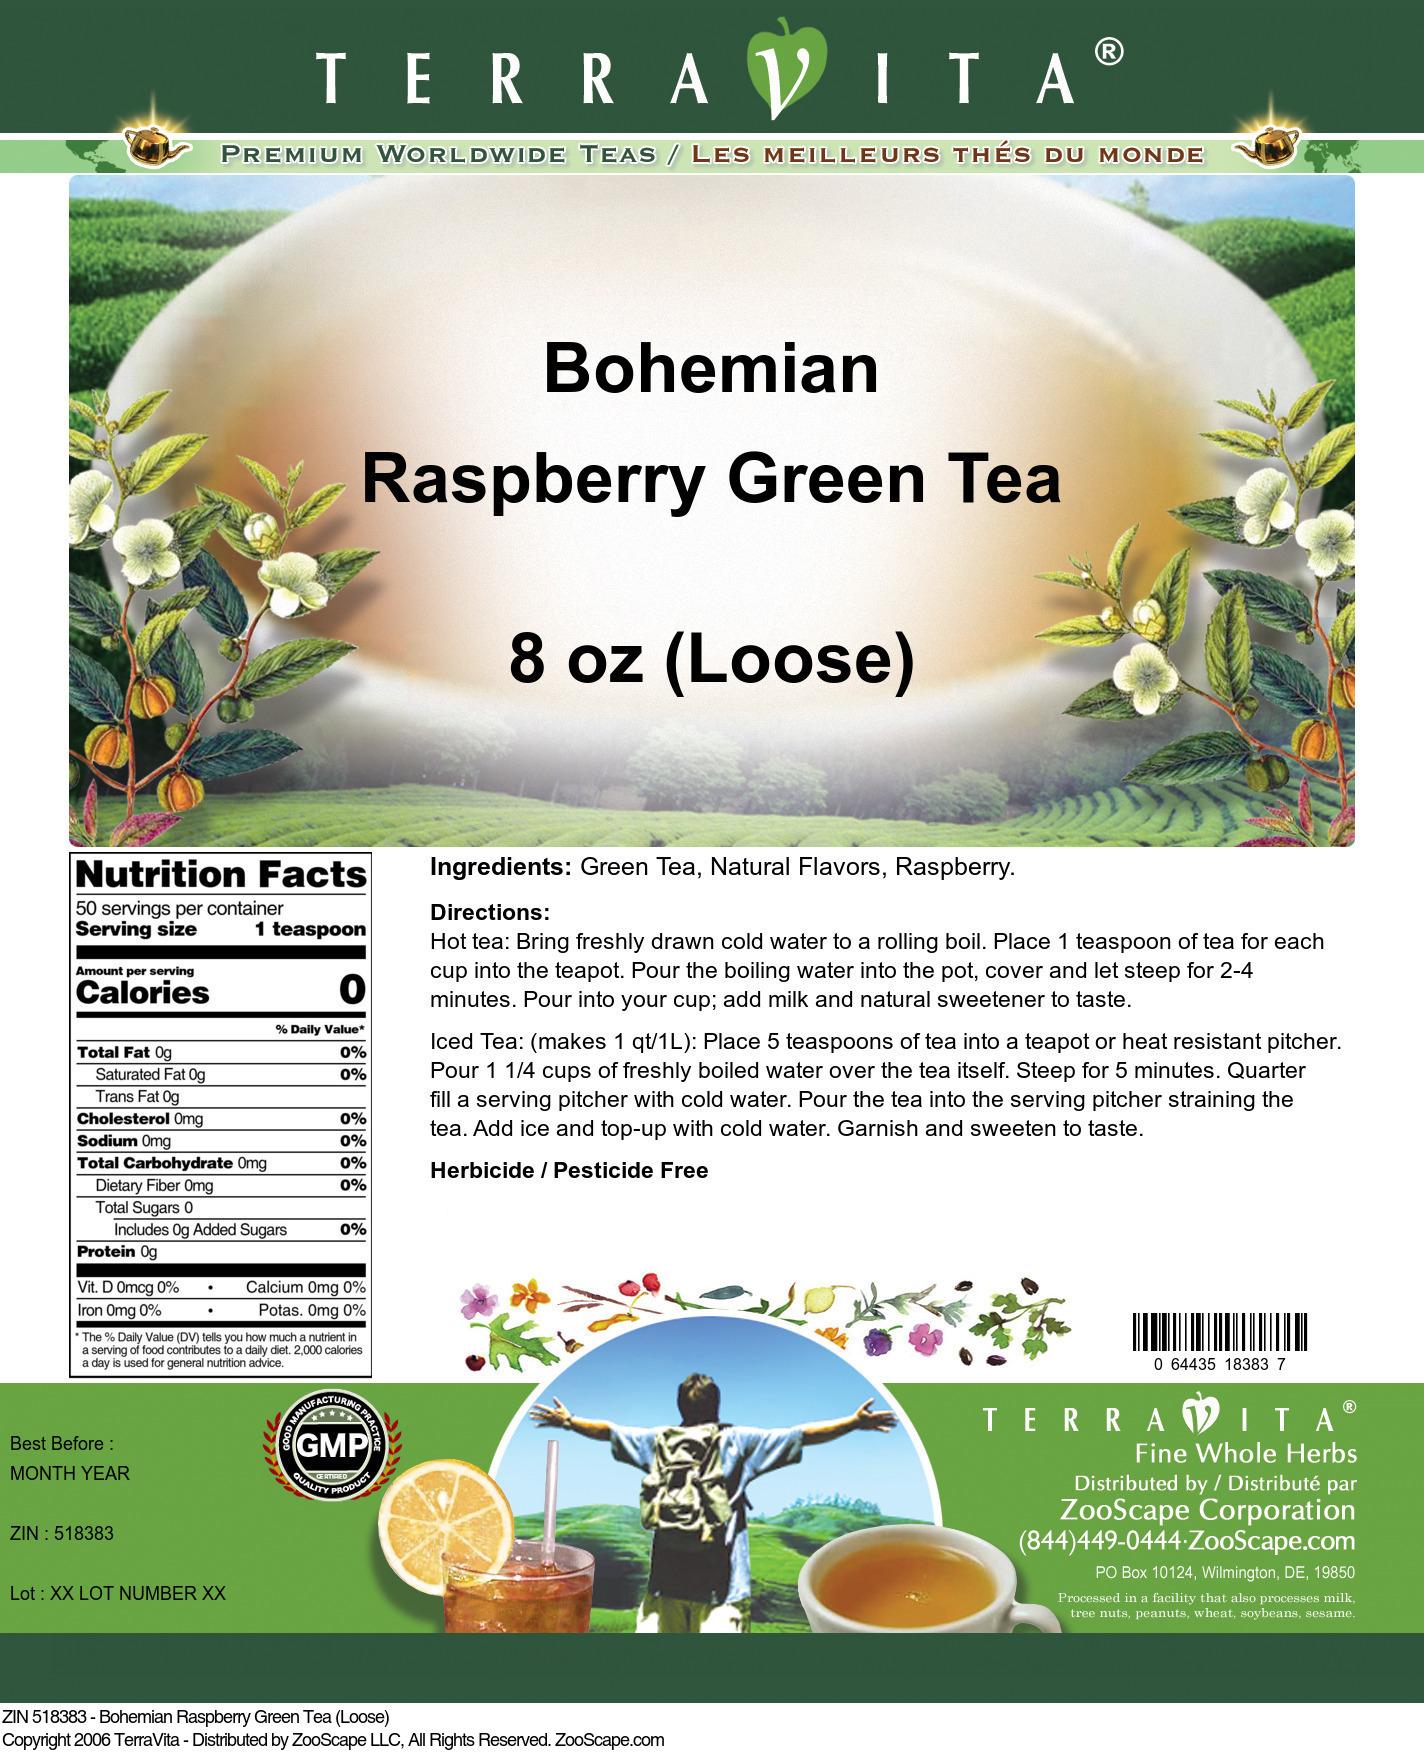 Bohemian Raspberry Green Tea (Loose)